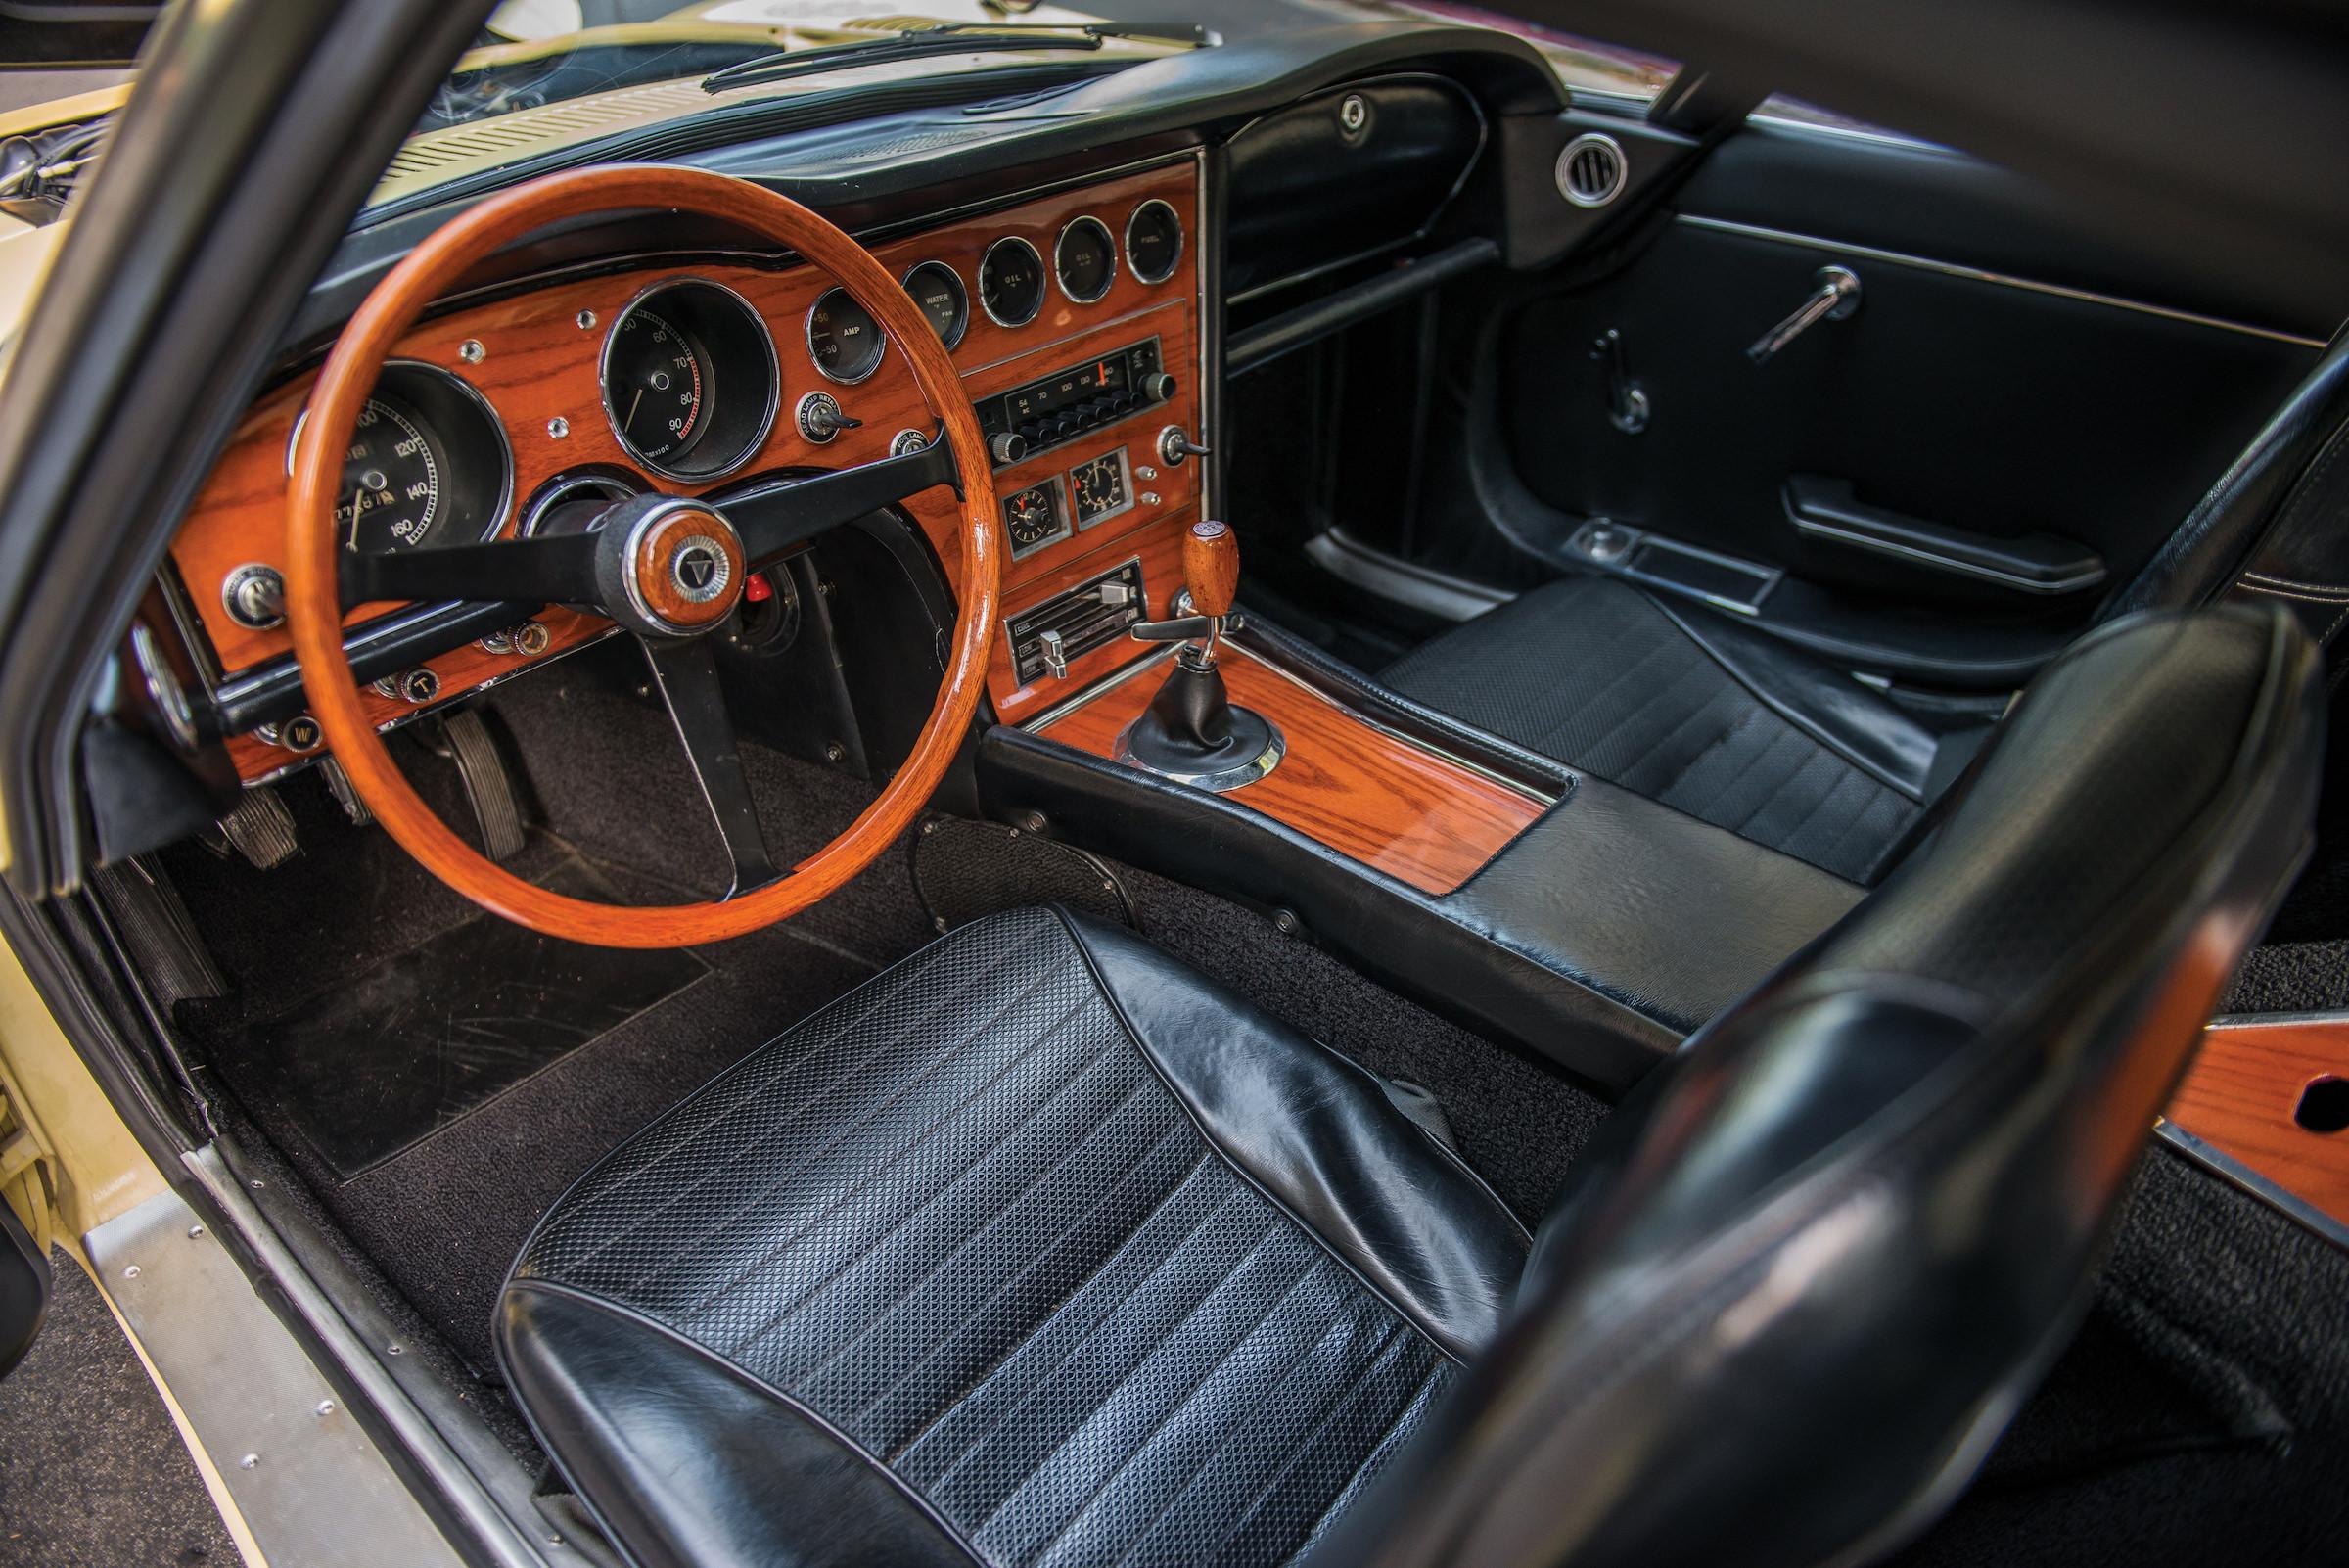 The Rare Toyota 2000gt